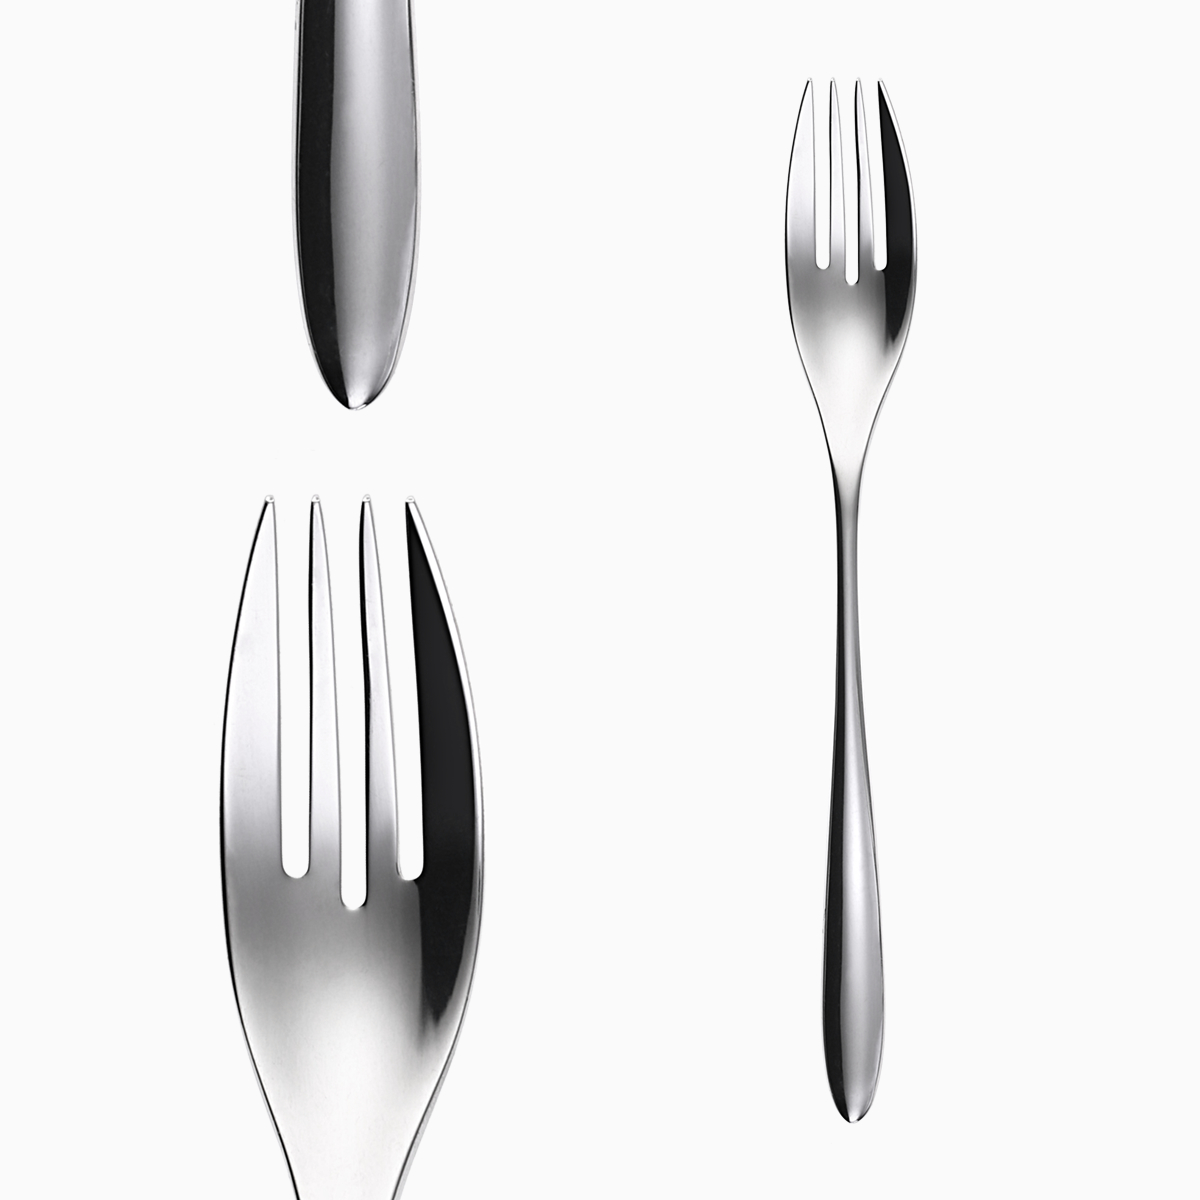 Table fork - Virginia